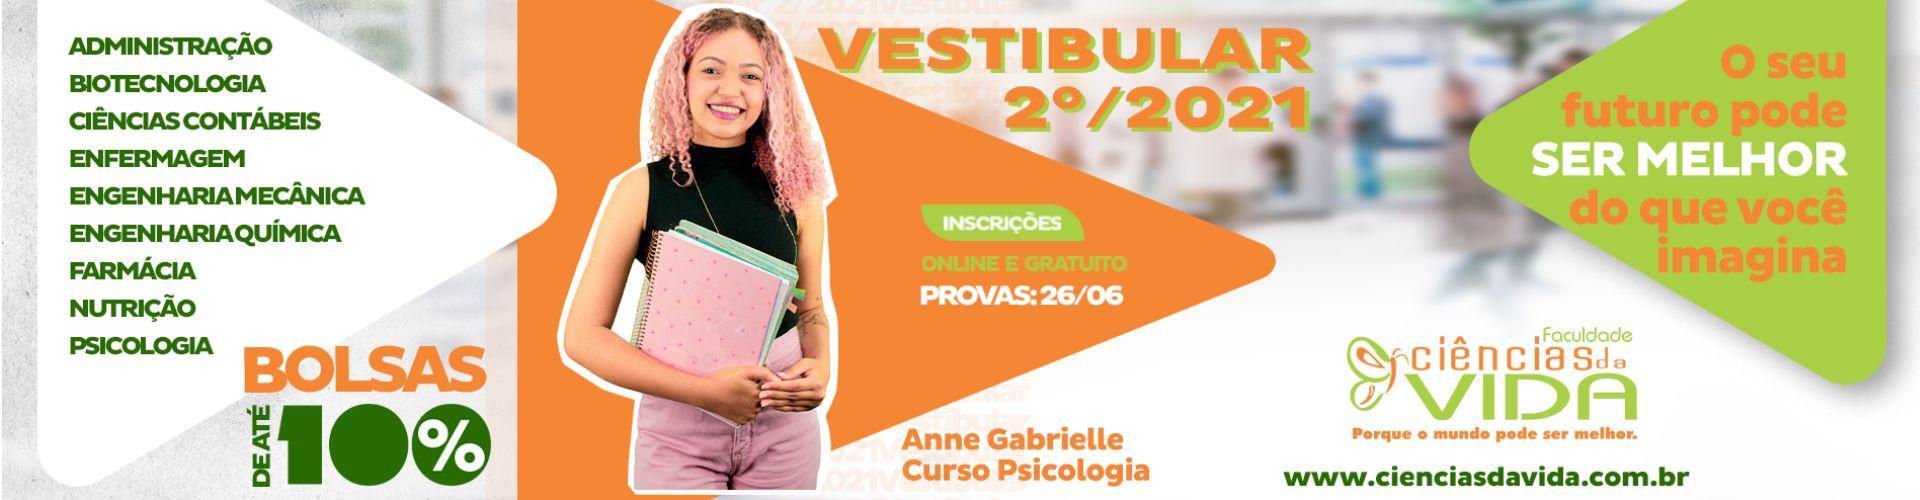 Vestibular 2º 2021